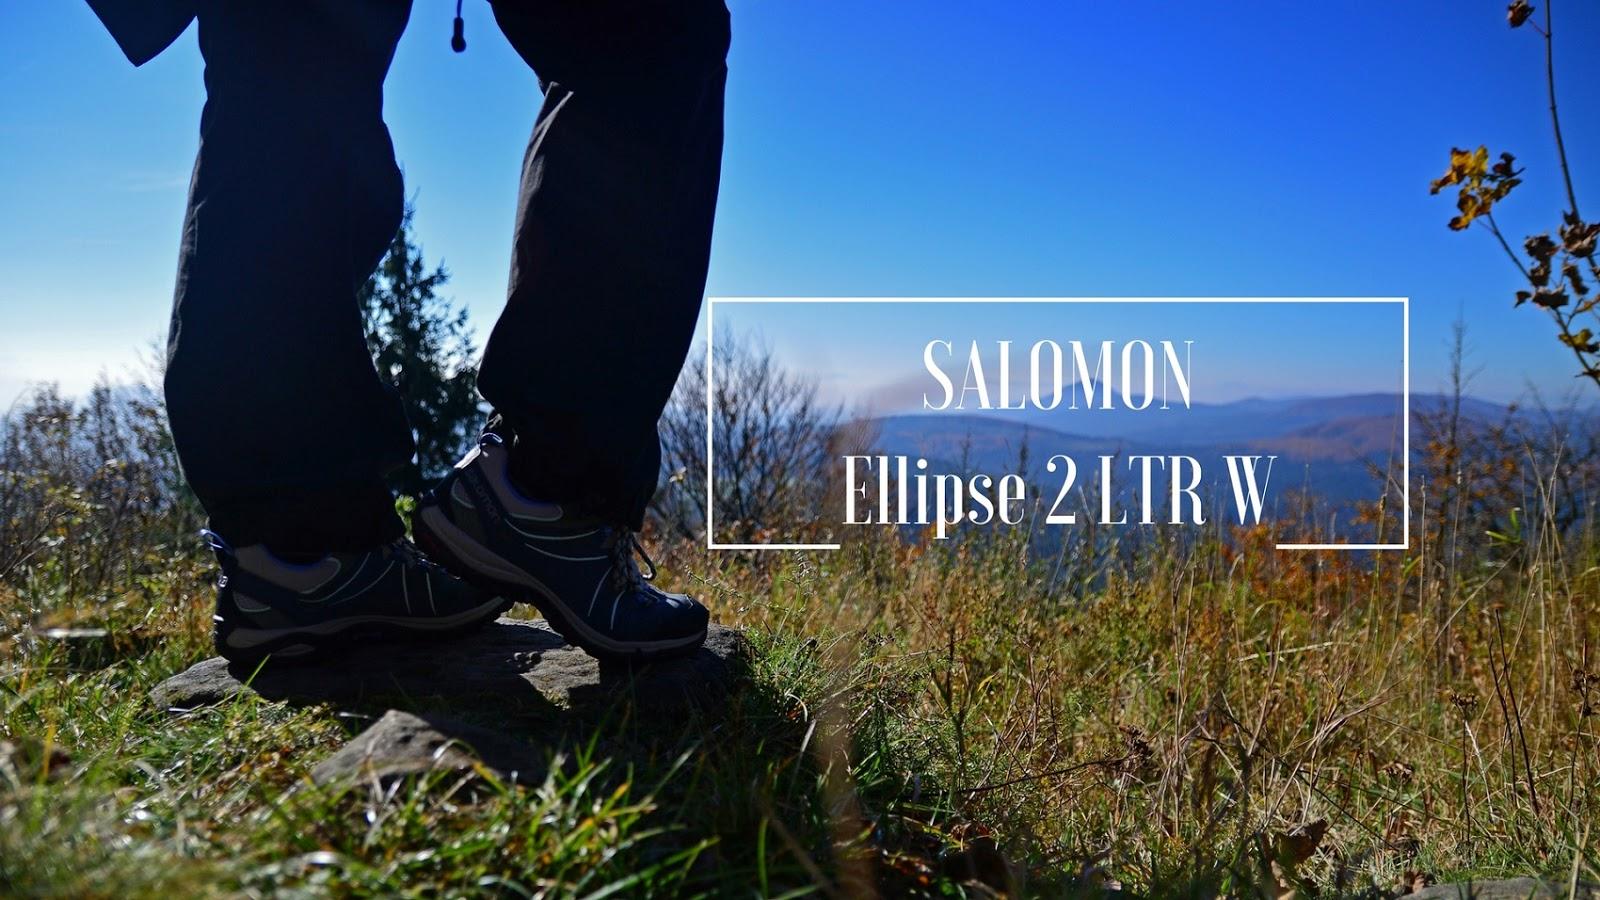 Buty turystczne Salomon Ellipse 2 LTR W opinia